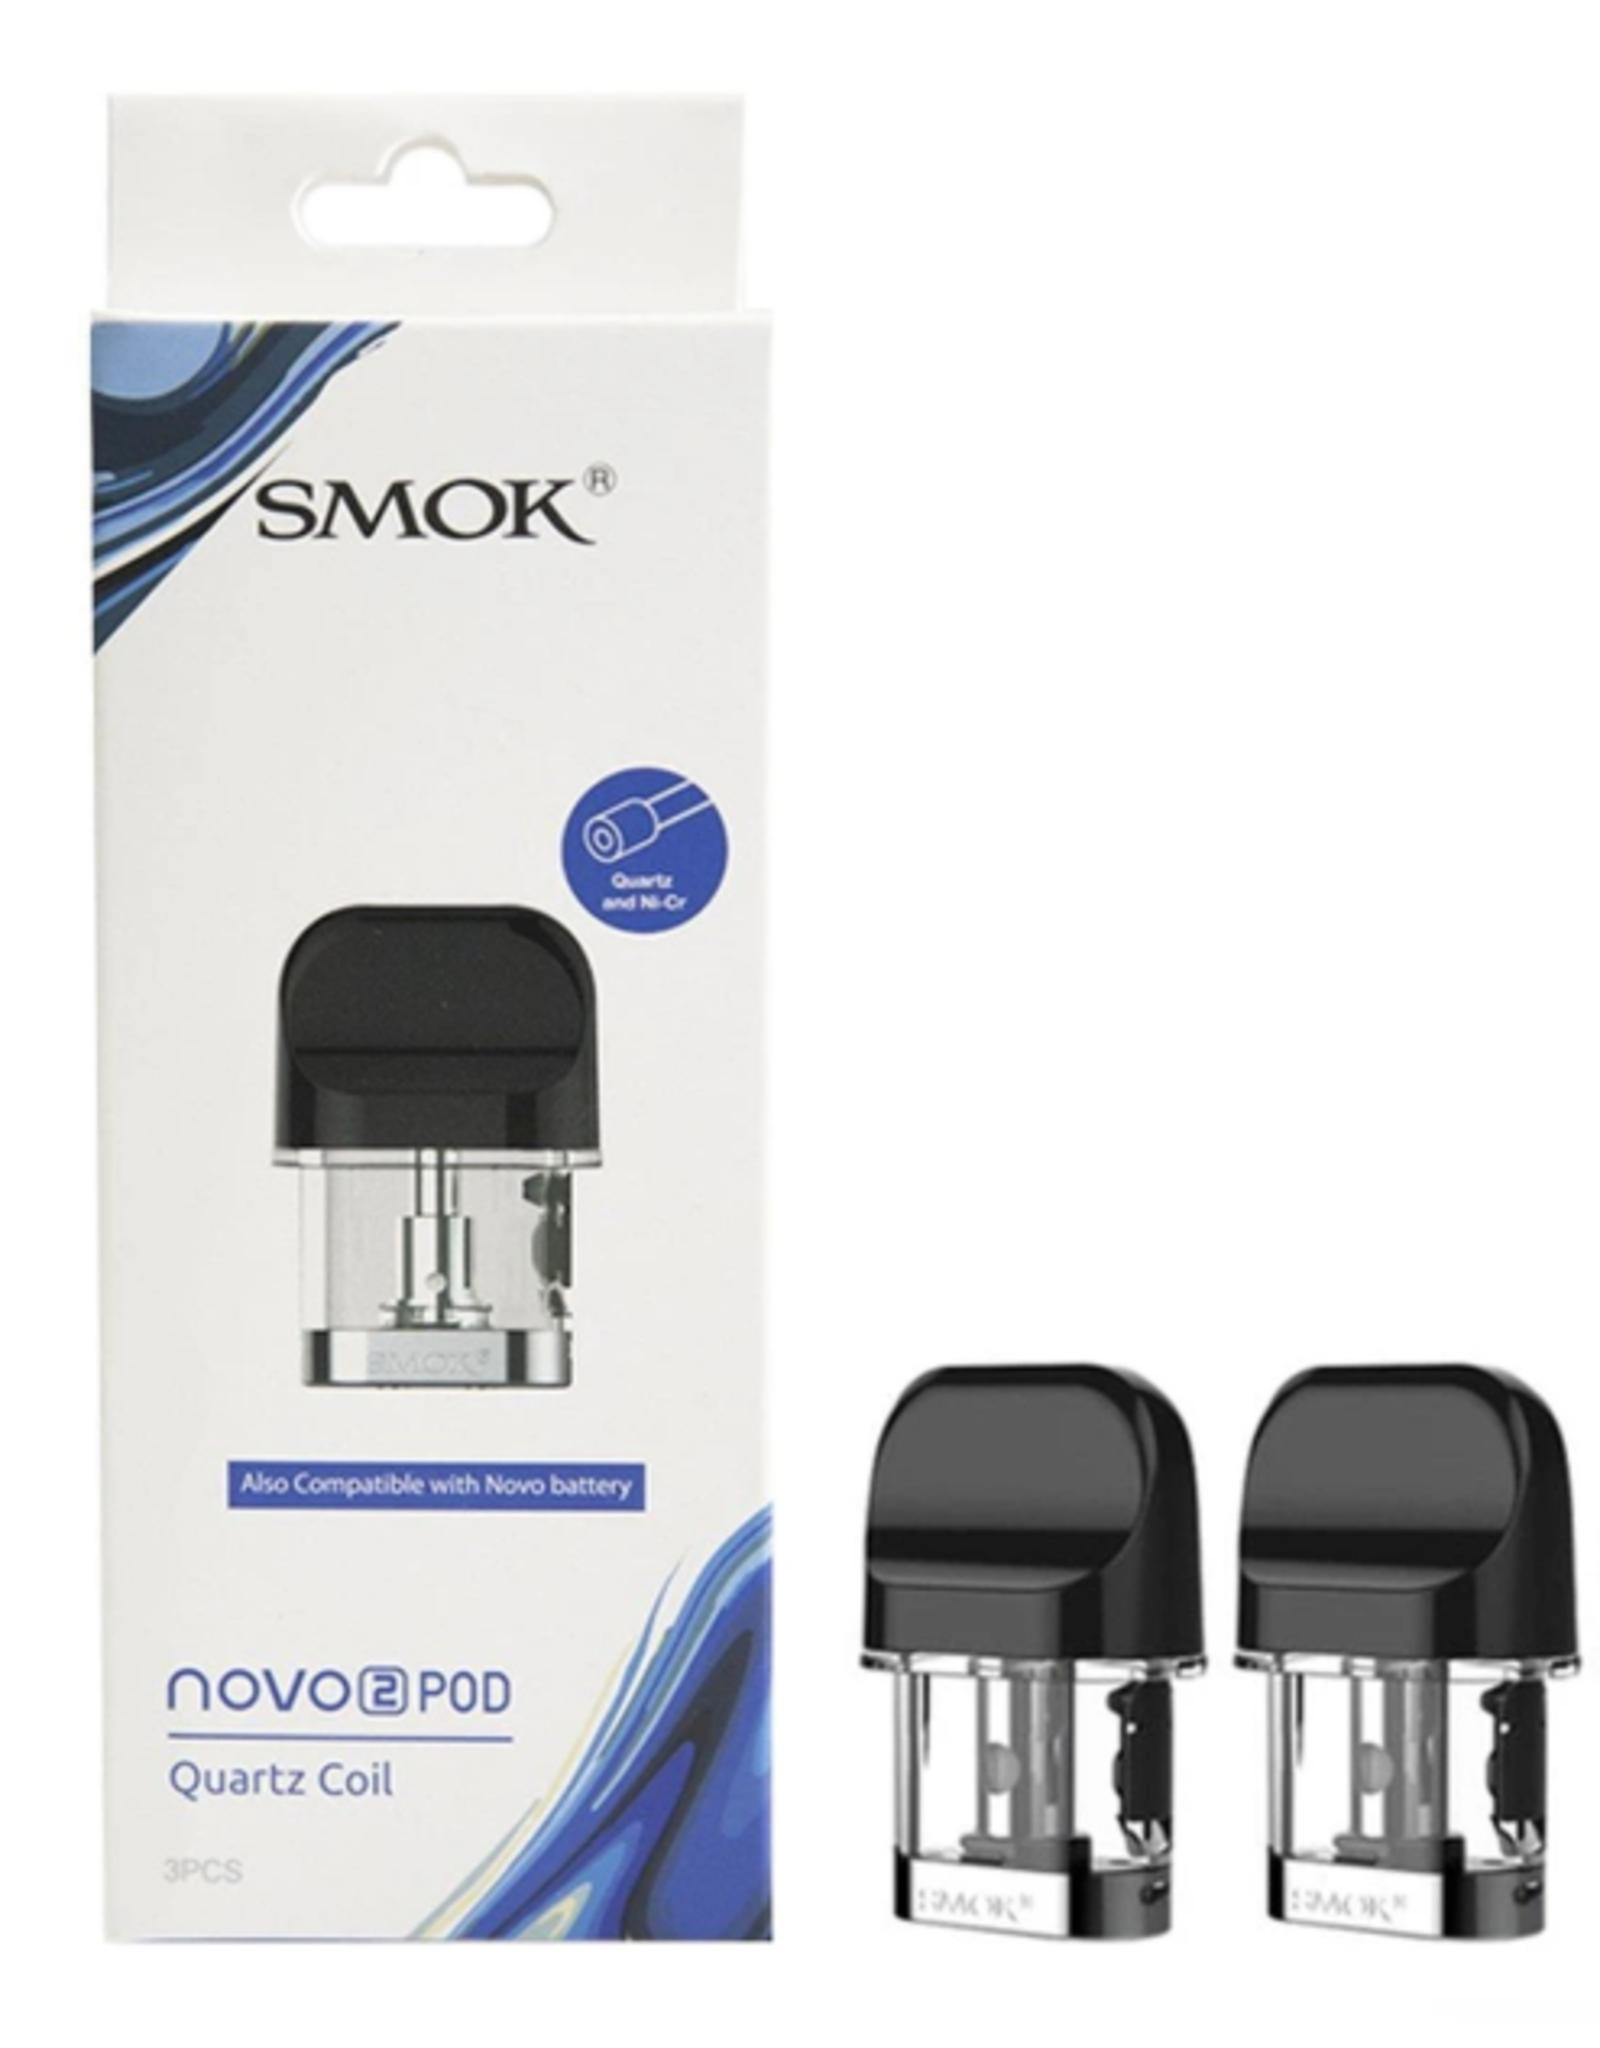 SMOK NOVO 2 Pod